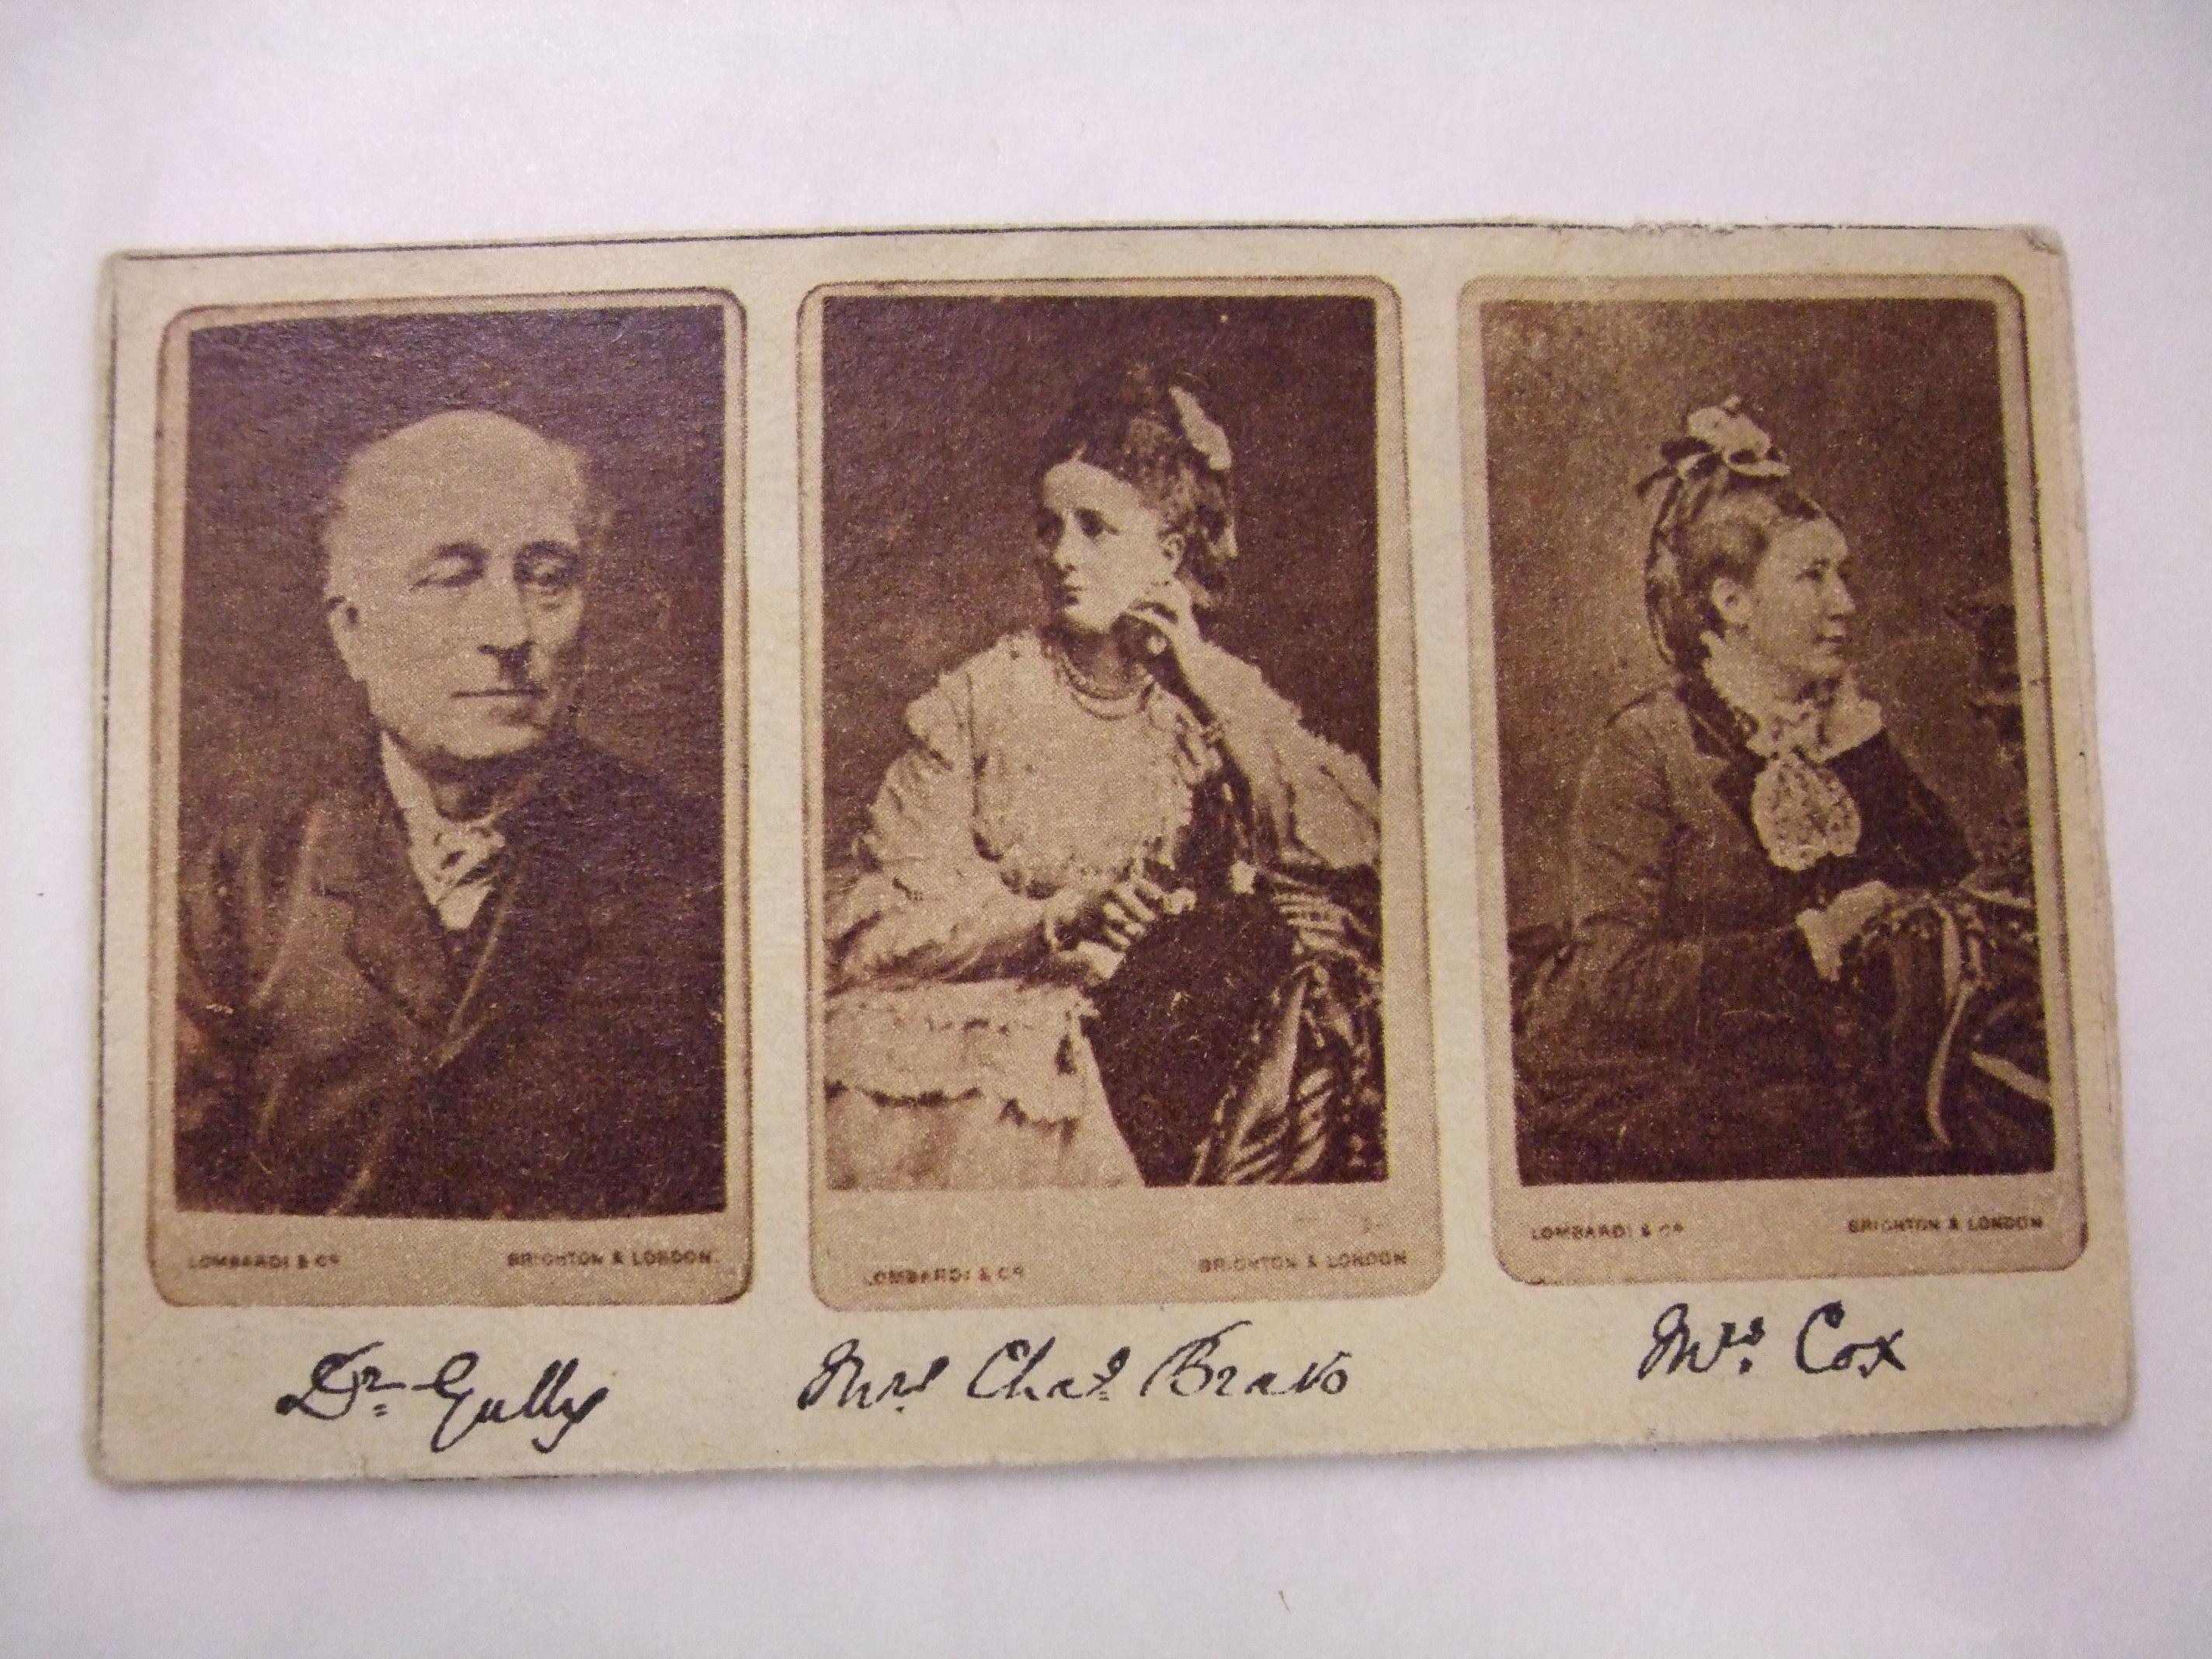 Three figures featured on this carte-de-visite